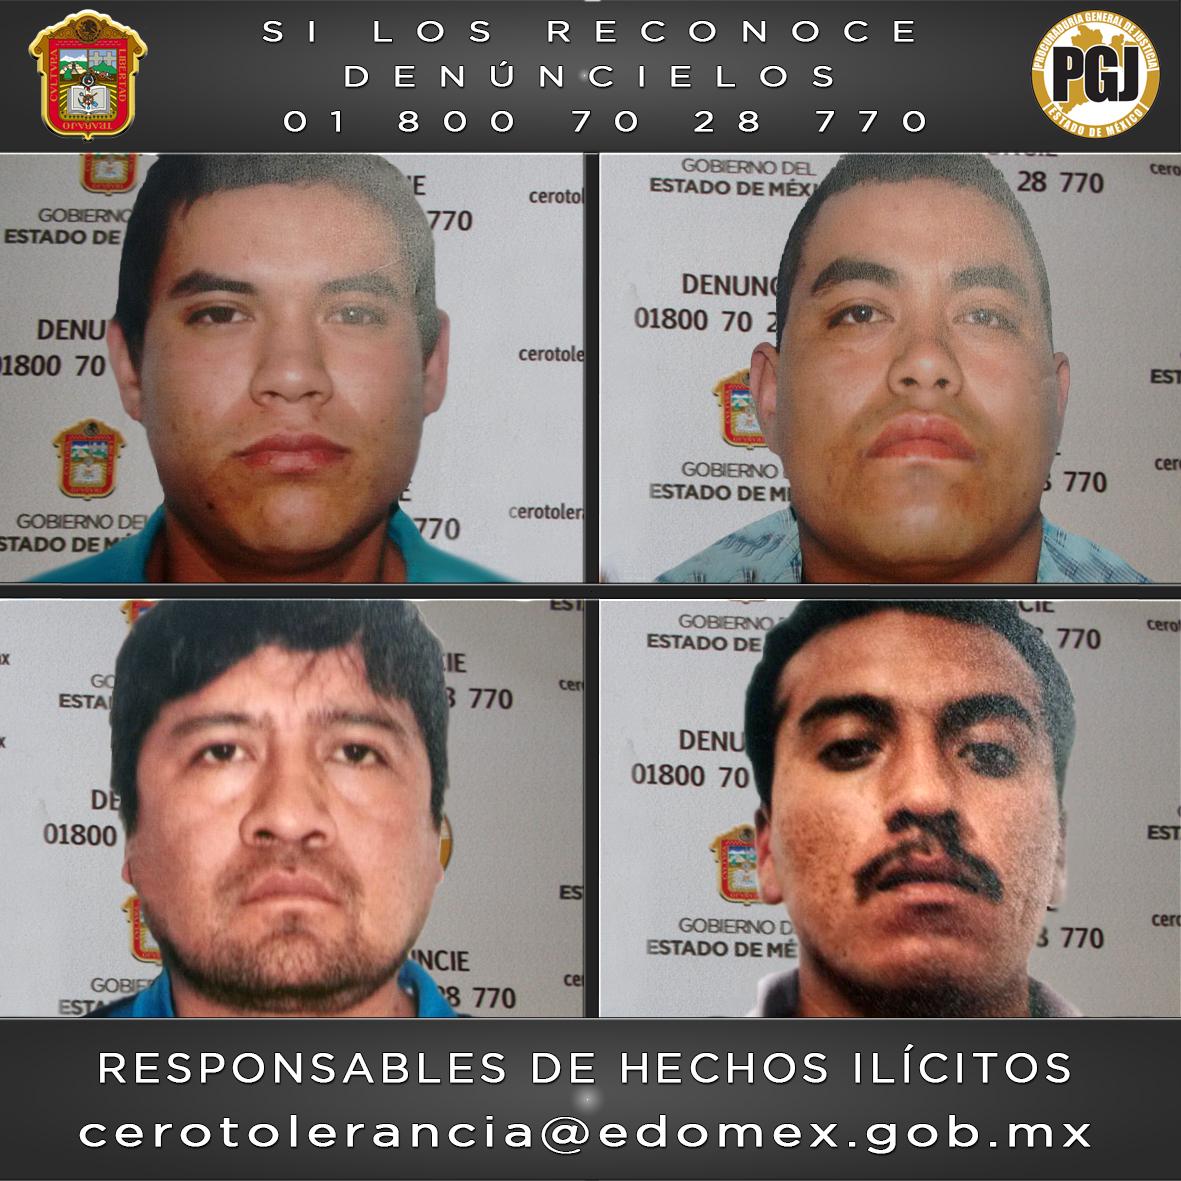 Pasarán 60 años en prisión secuestradores de ex presidente municipal de Amanalco